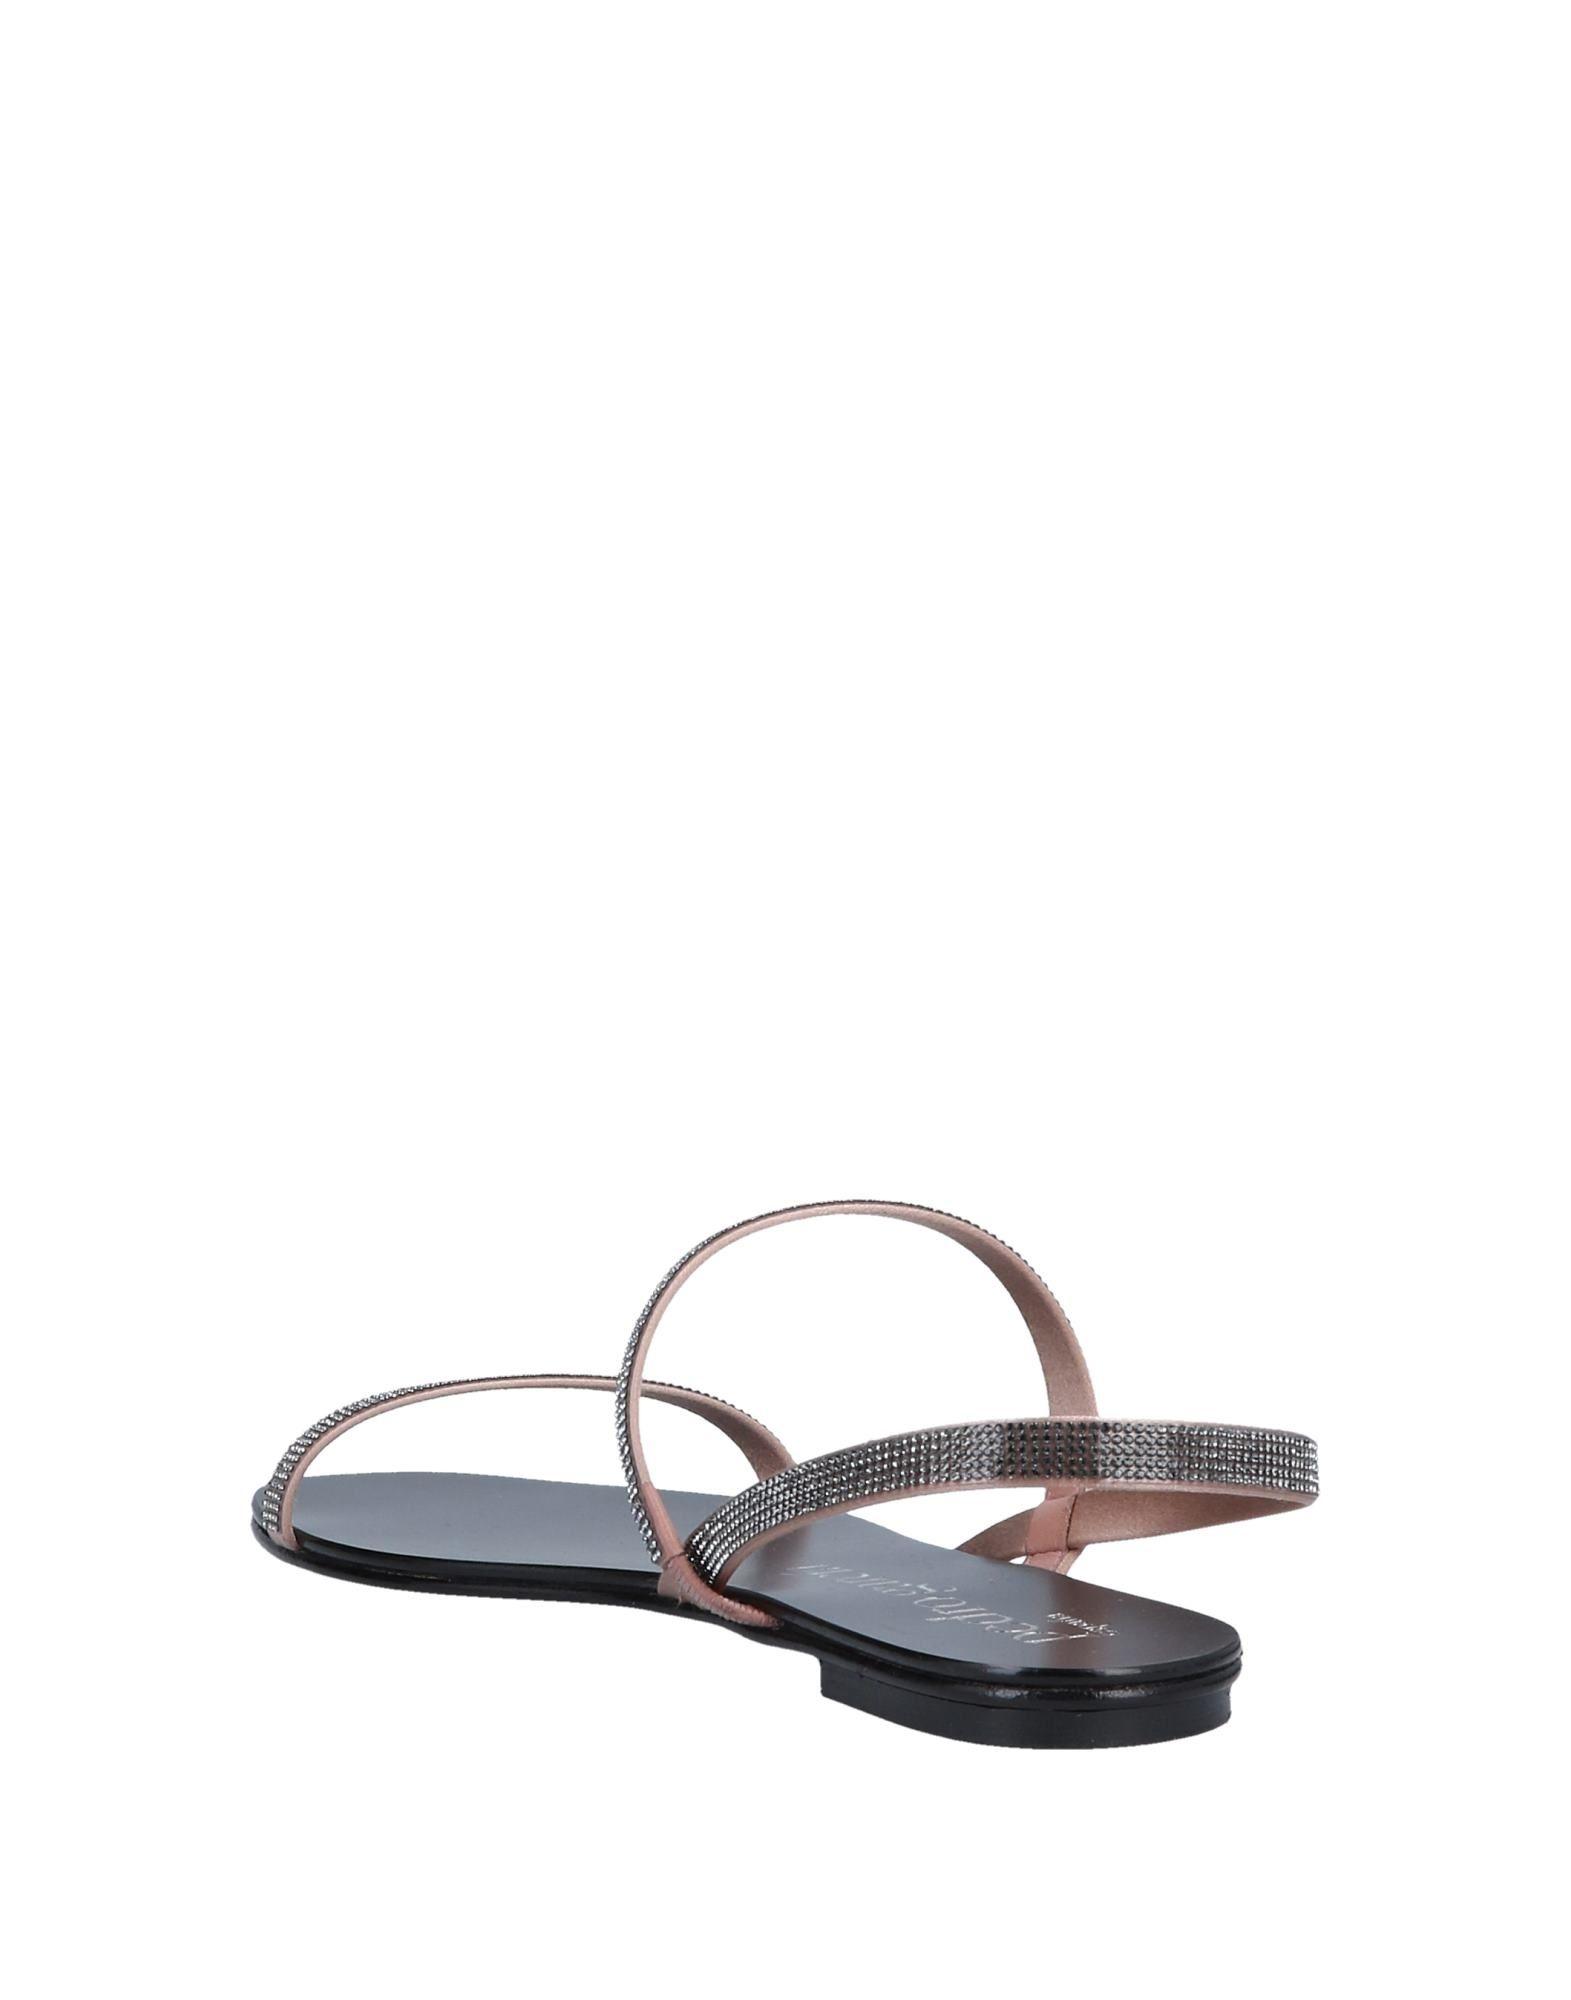 Rabatt Schuhe Pedro García Sandalen 11572481IP Damen  11572481IP Sandalen 9230fe